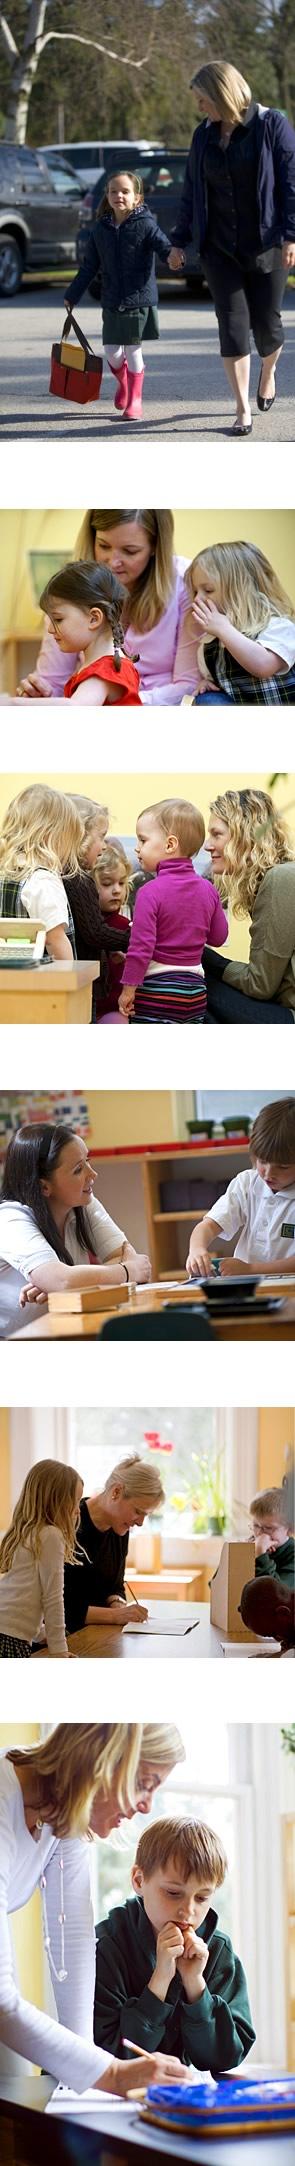 Clanmore Montessori School teachers